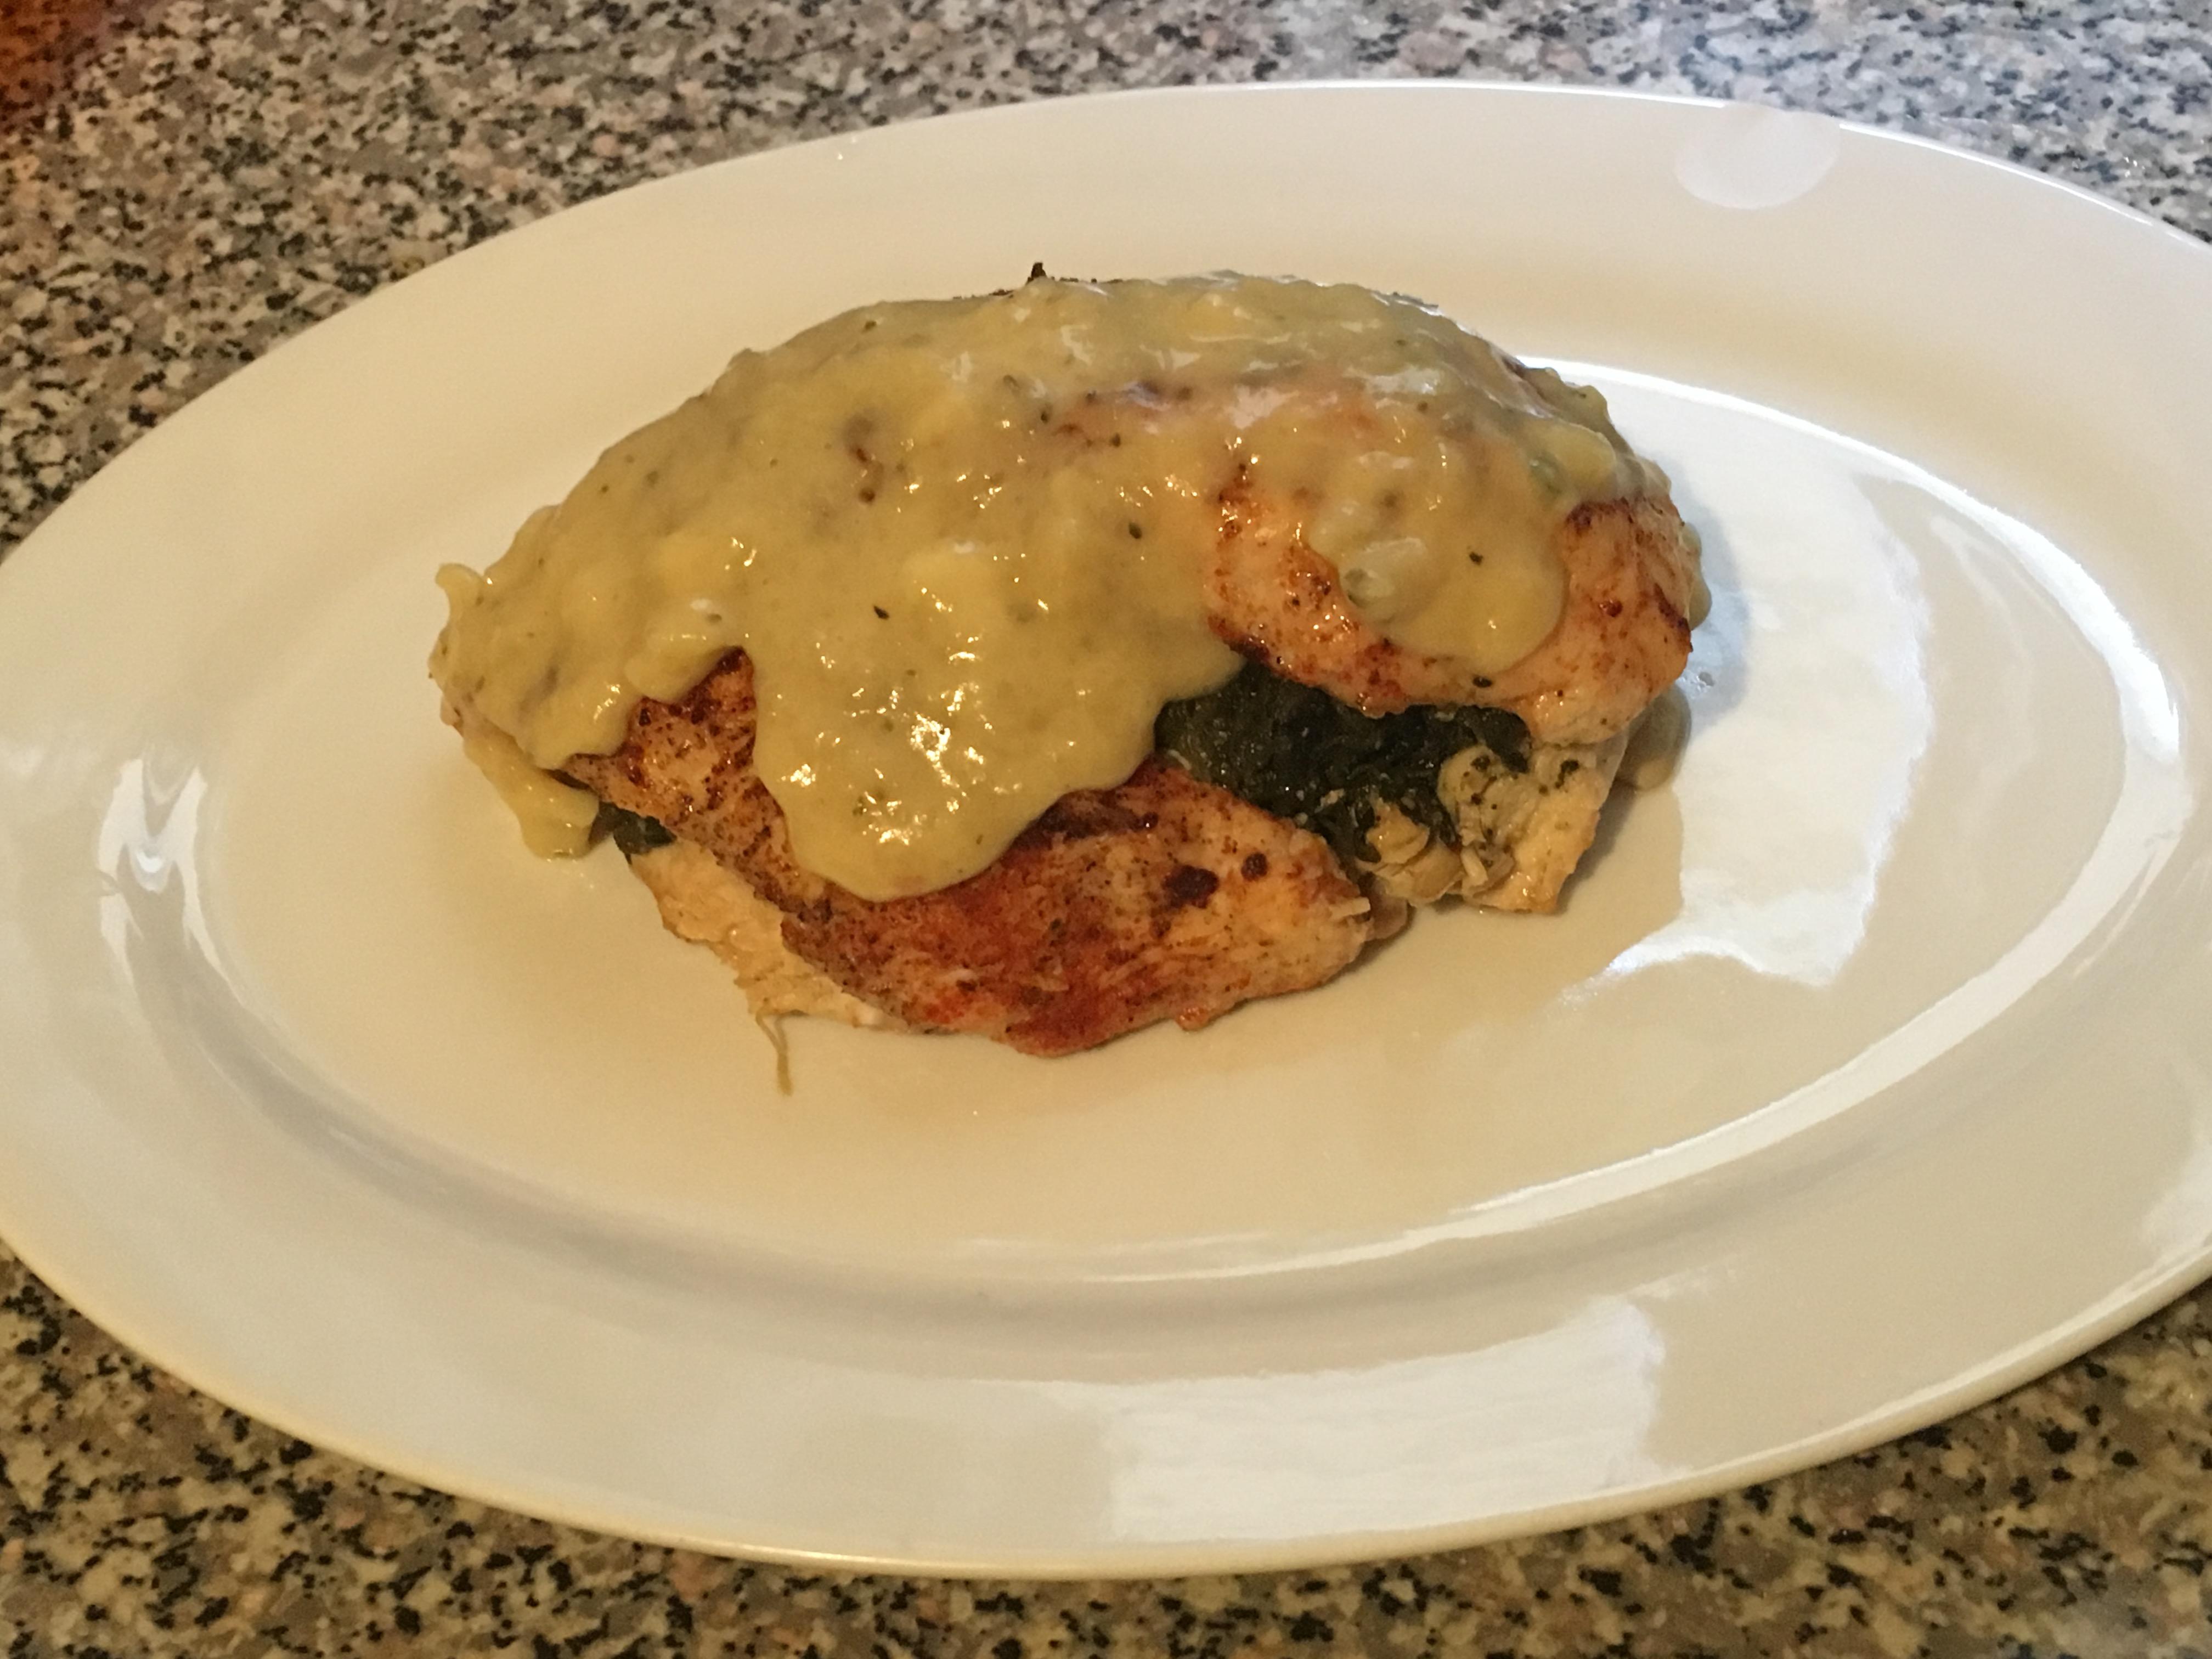 Spinach Stuffed Chicken and Gravy Christina Pannese